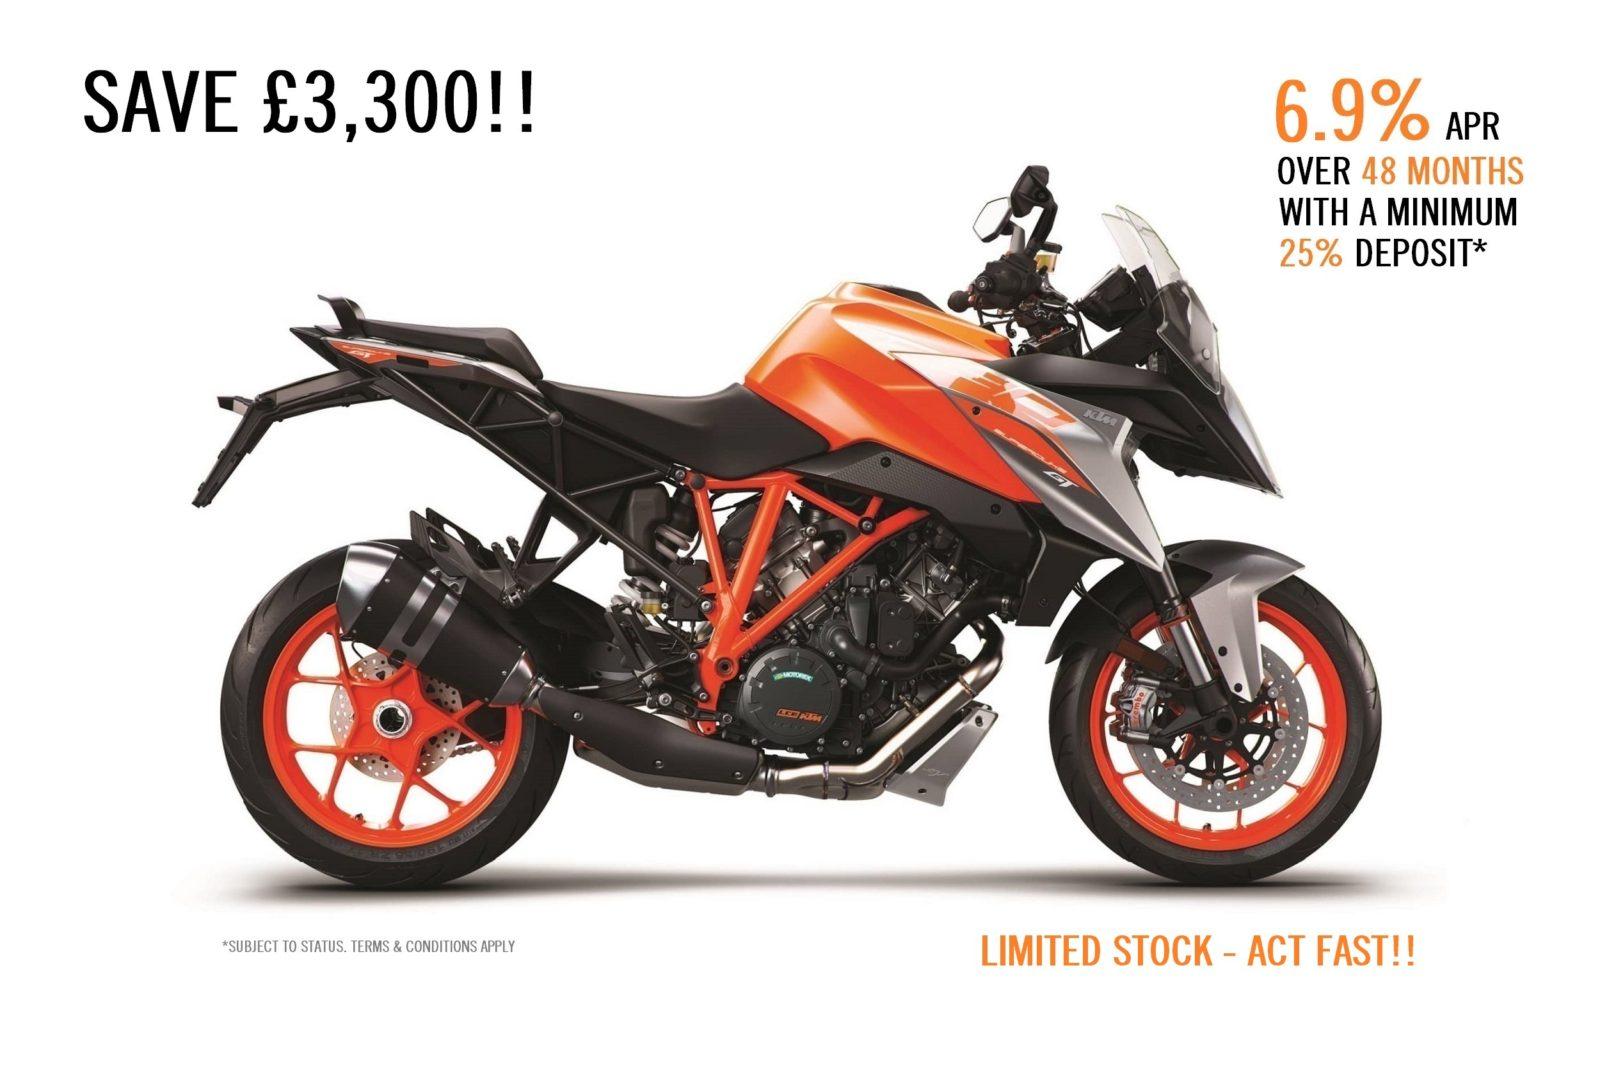 KTM 1290 SUPER DUKE GT - 2018 **SAVE £3300!!**